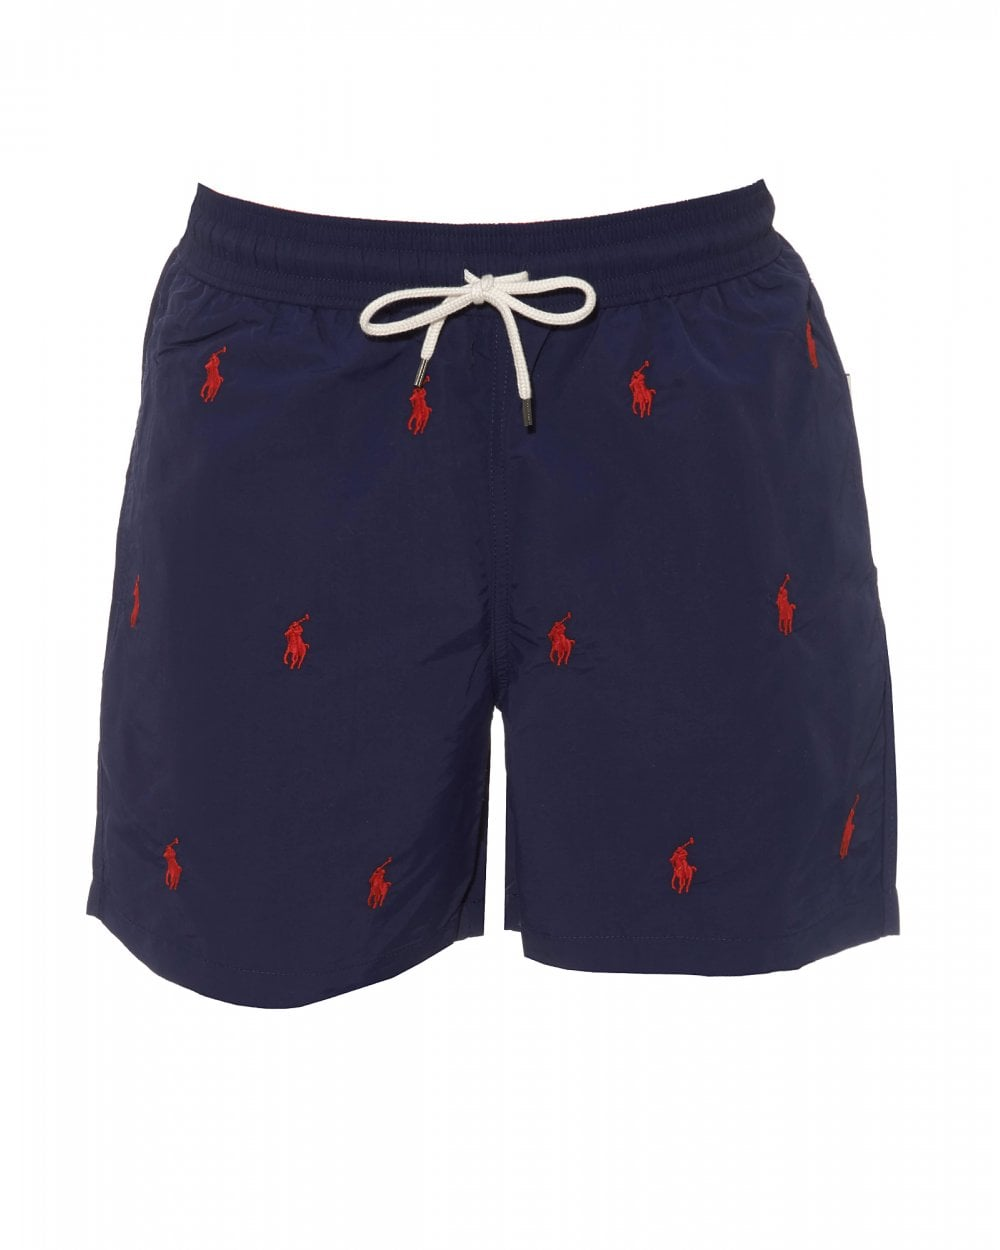 7337b110eb6ee Mens Pony Swimshorts, Newport Navy Traveler Swimming Trunks